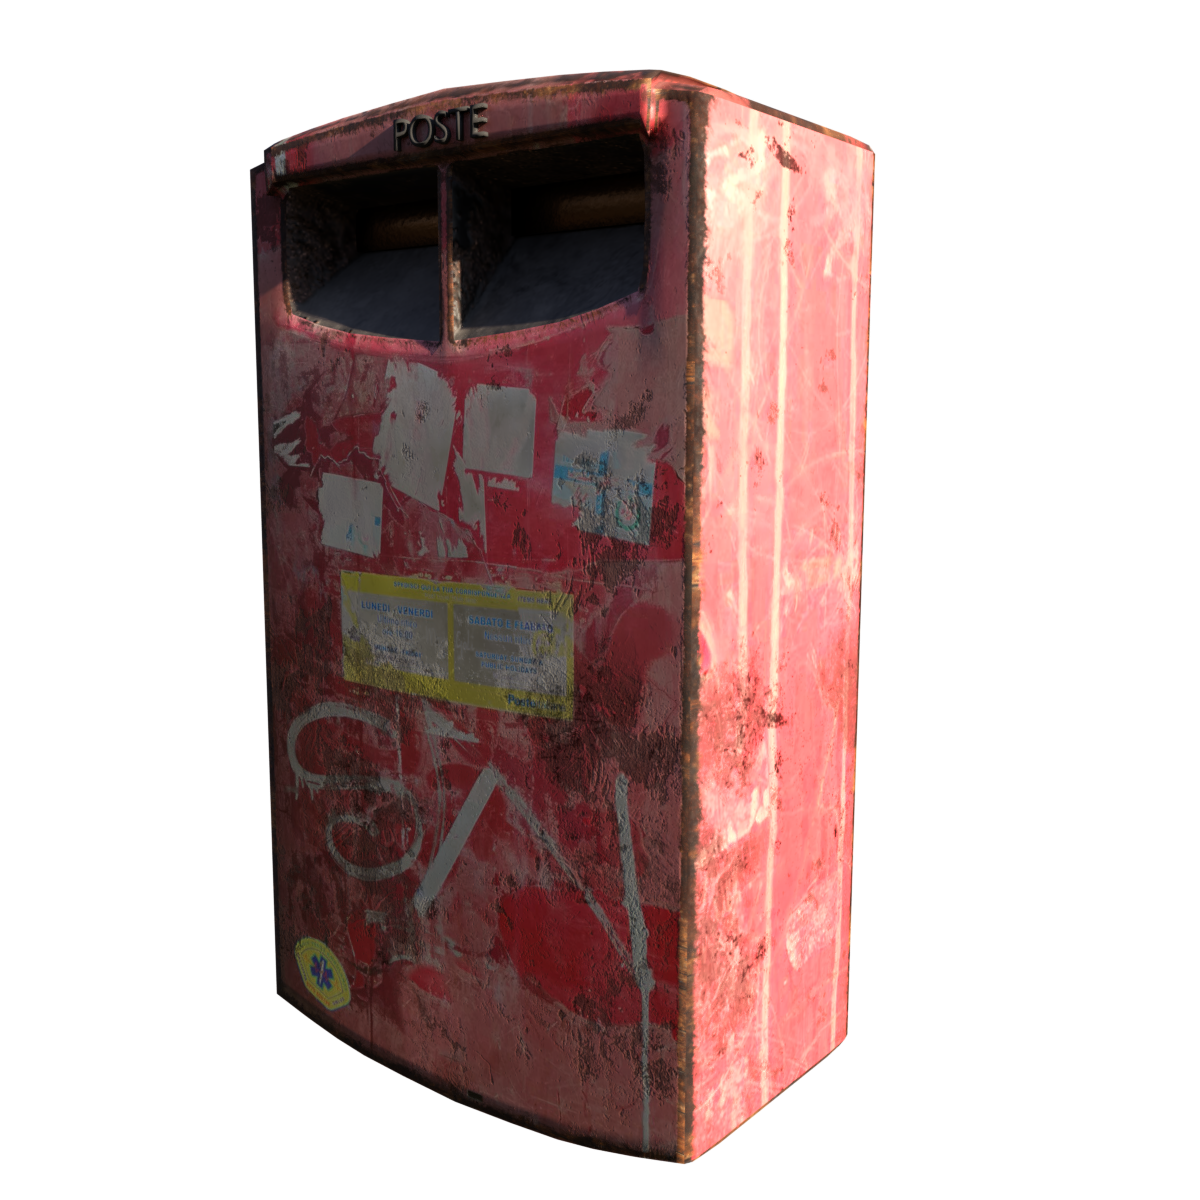 cassette_poste.png